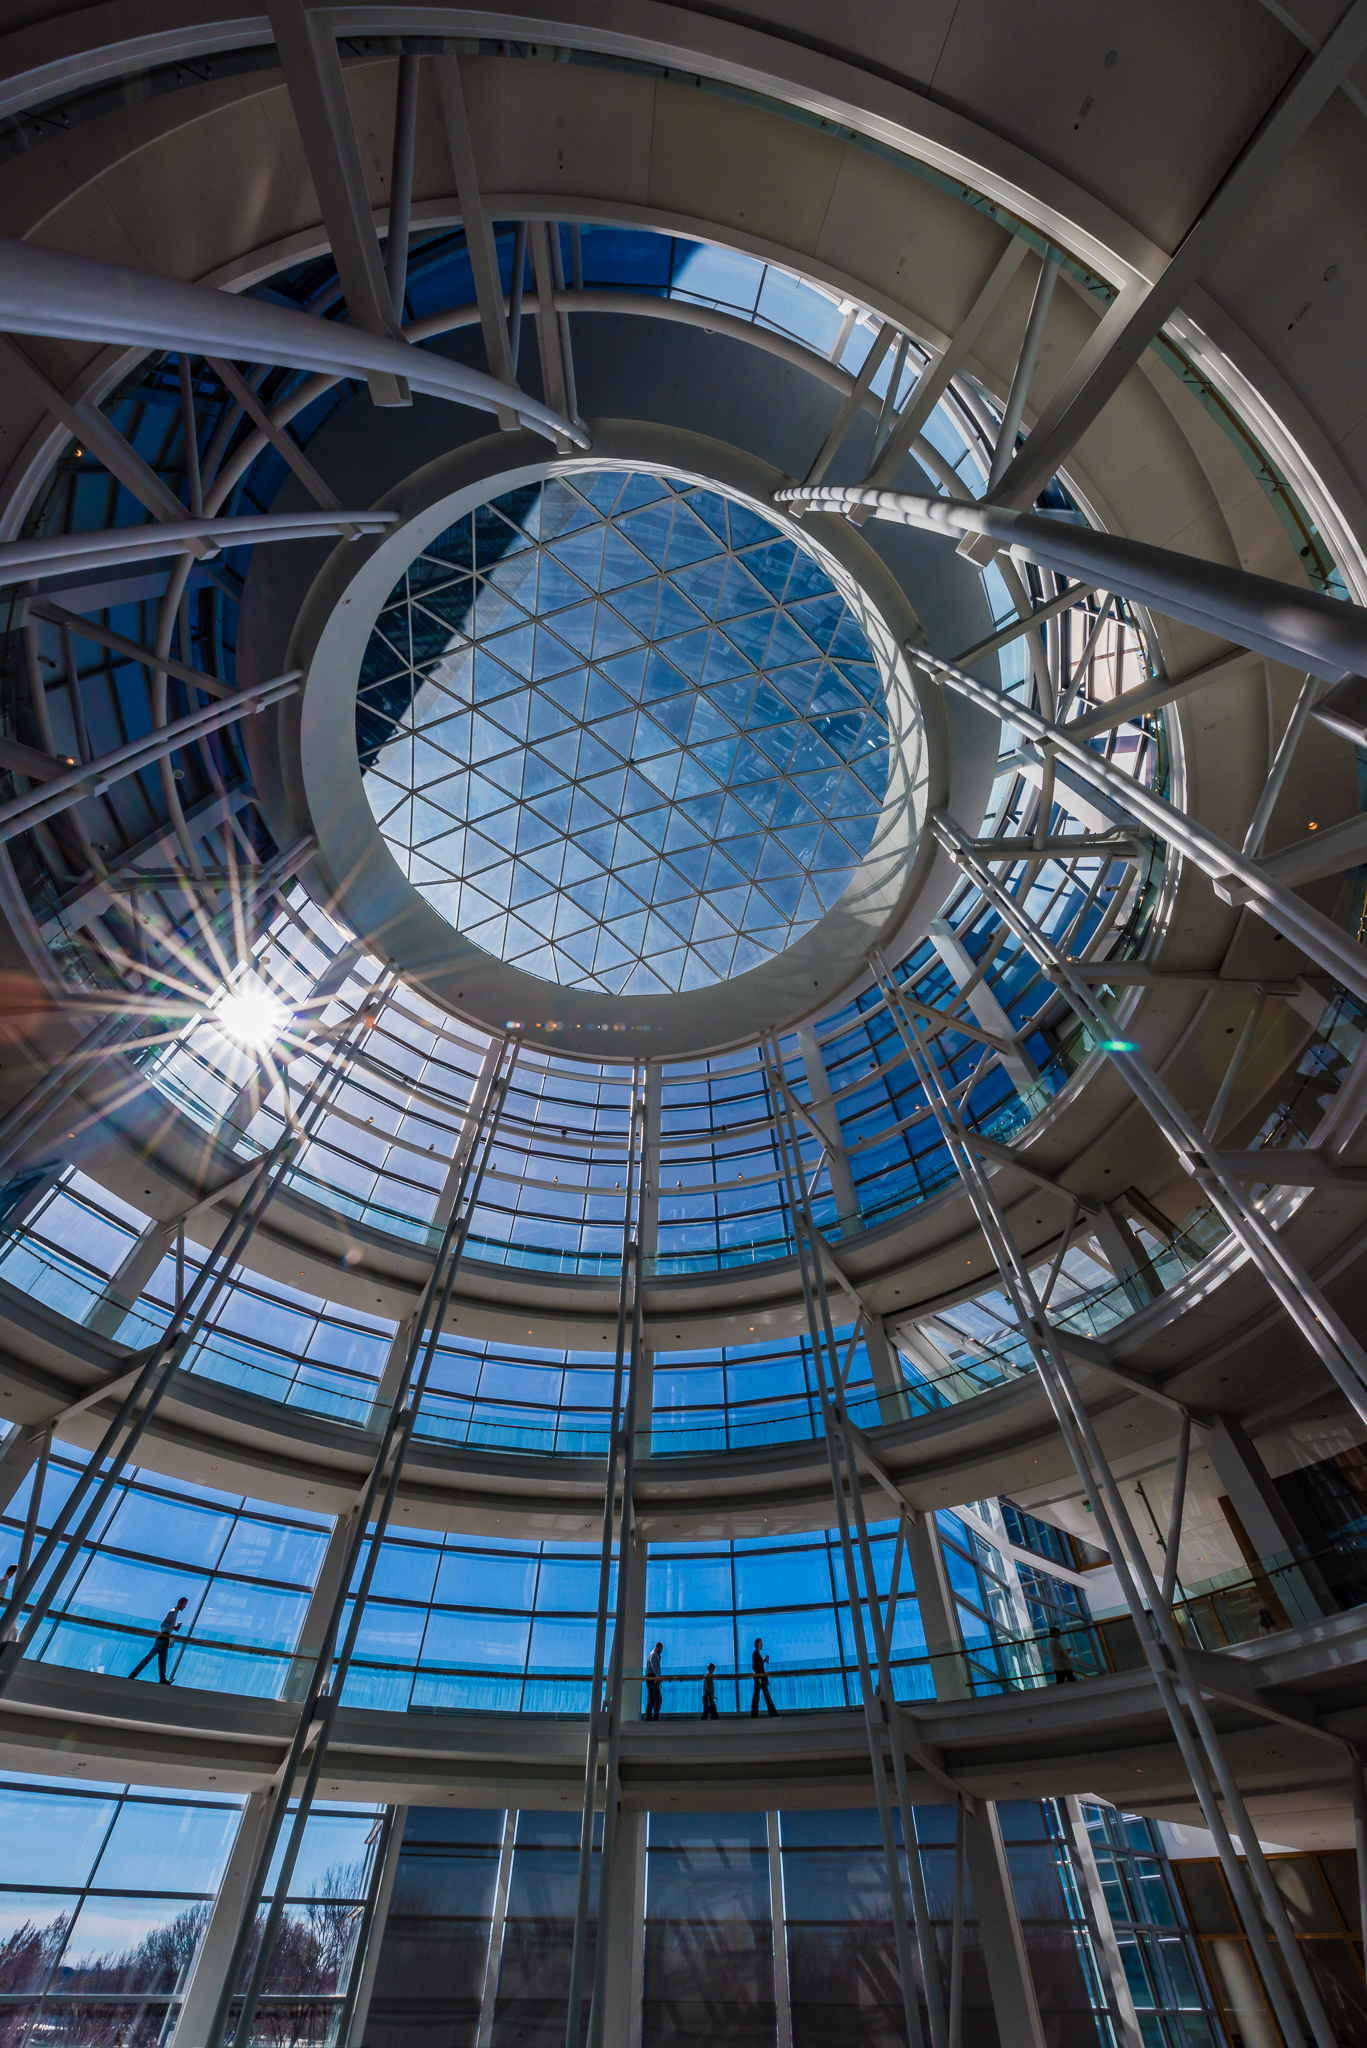 OKC's Devon Tower Atrium